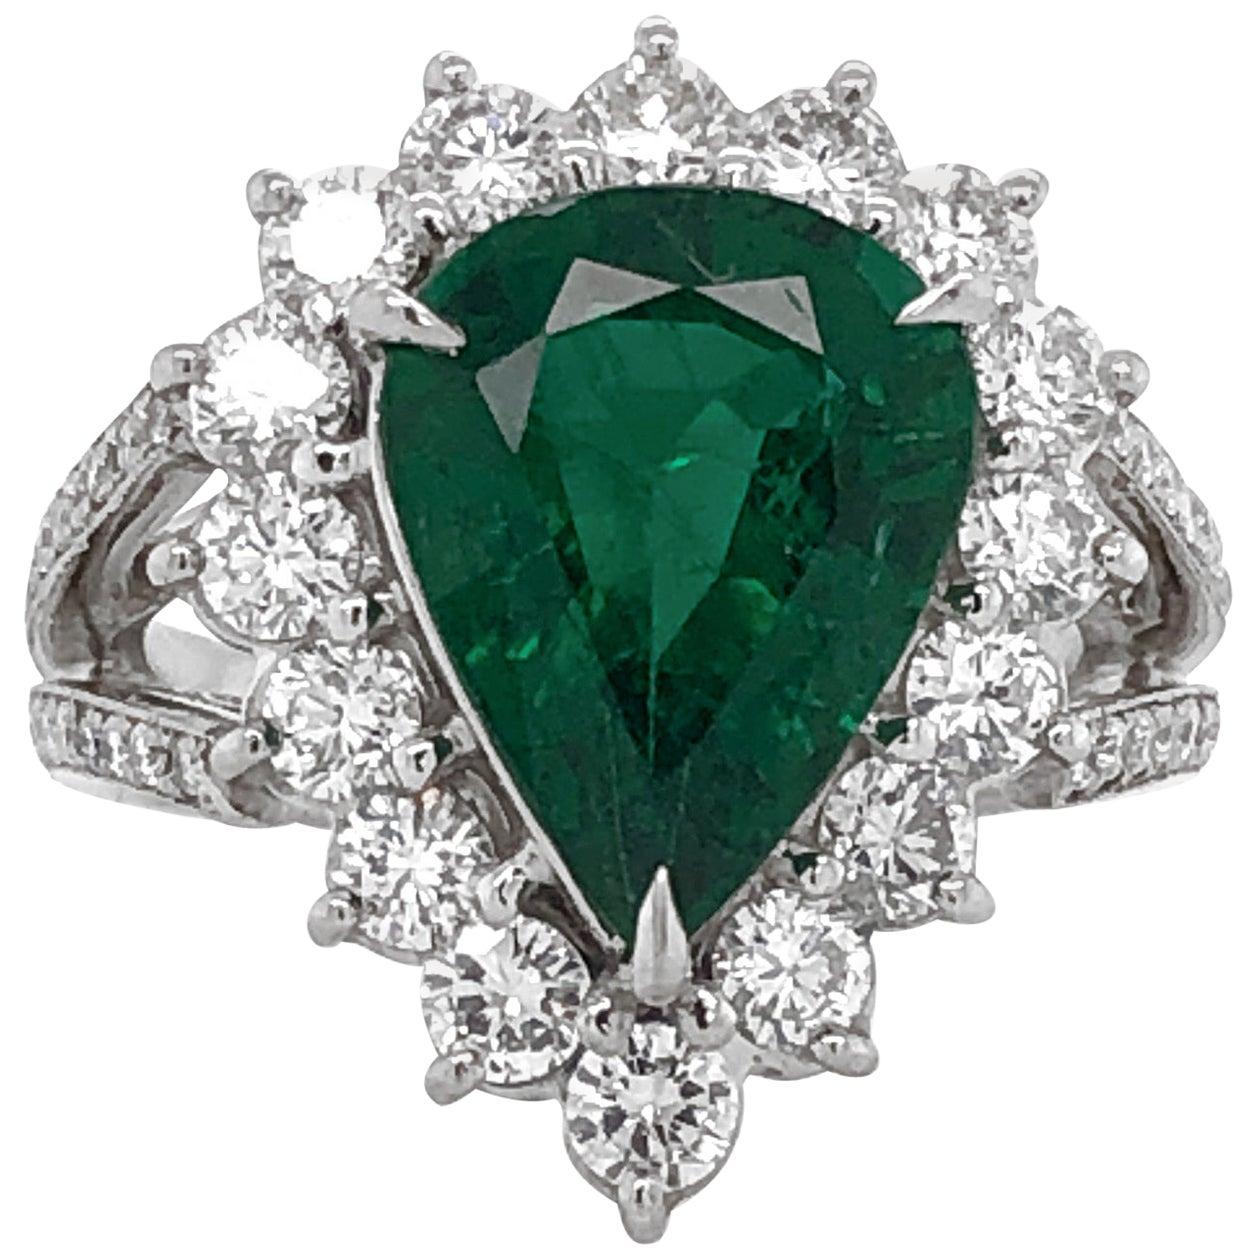 Certified Emerald Pear Cut 3.66 Carat Diamond 1.36 Carat Total Platinum Ring